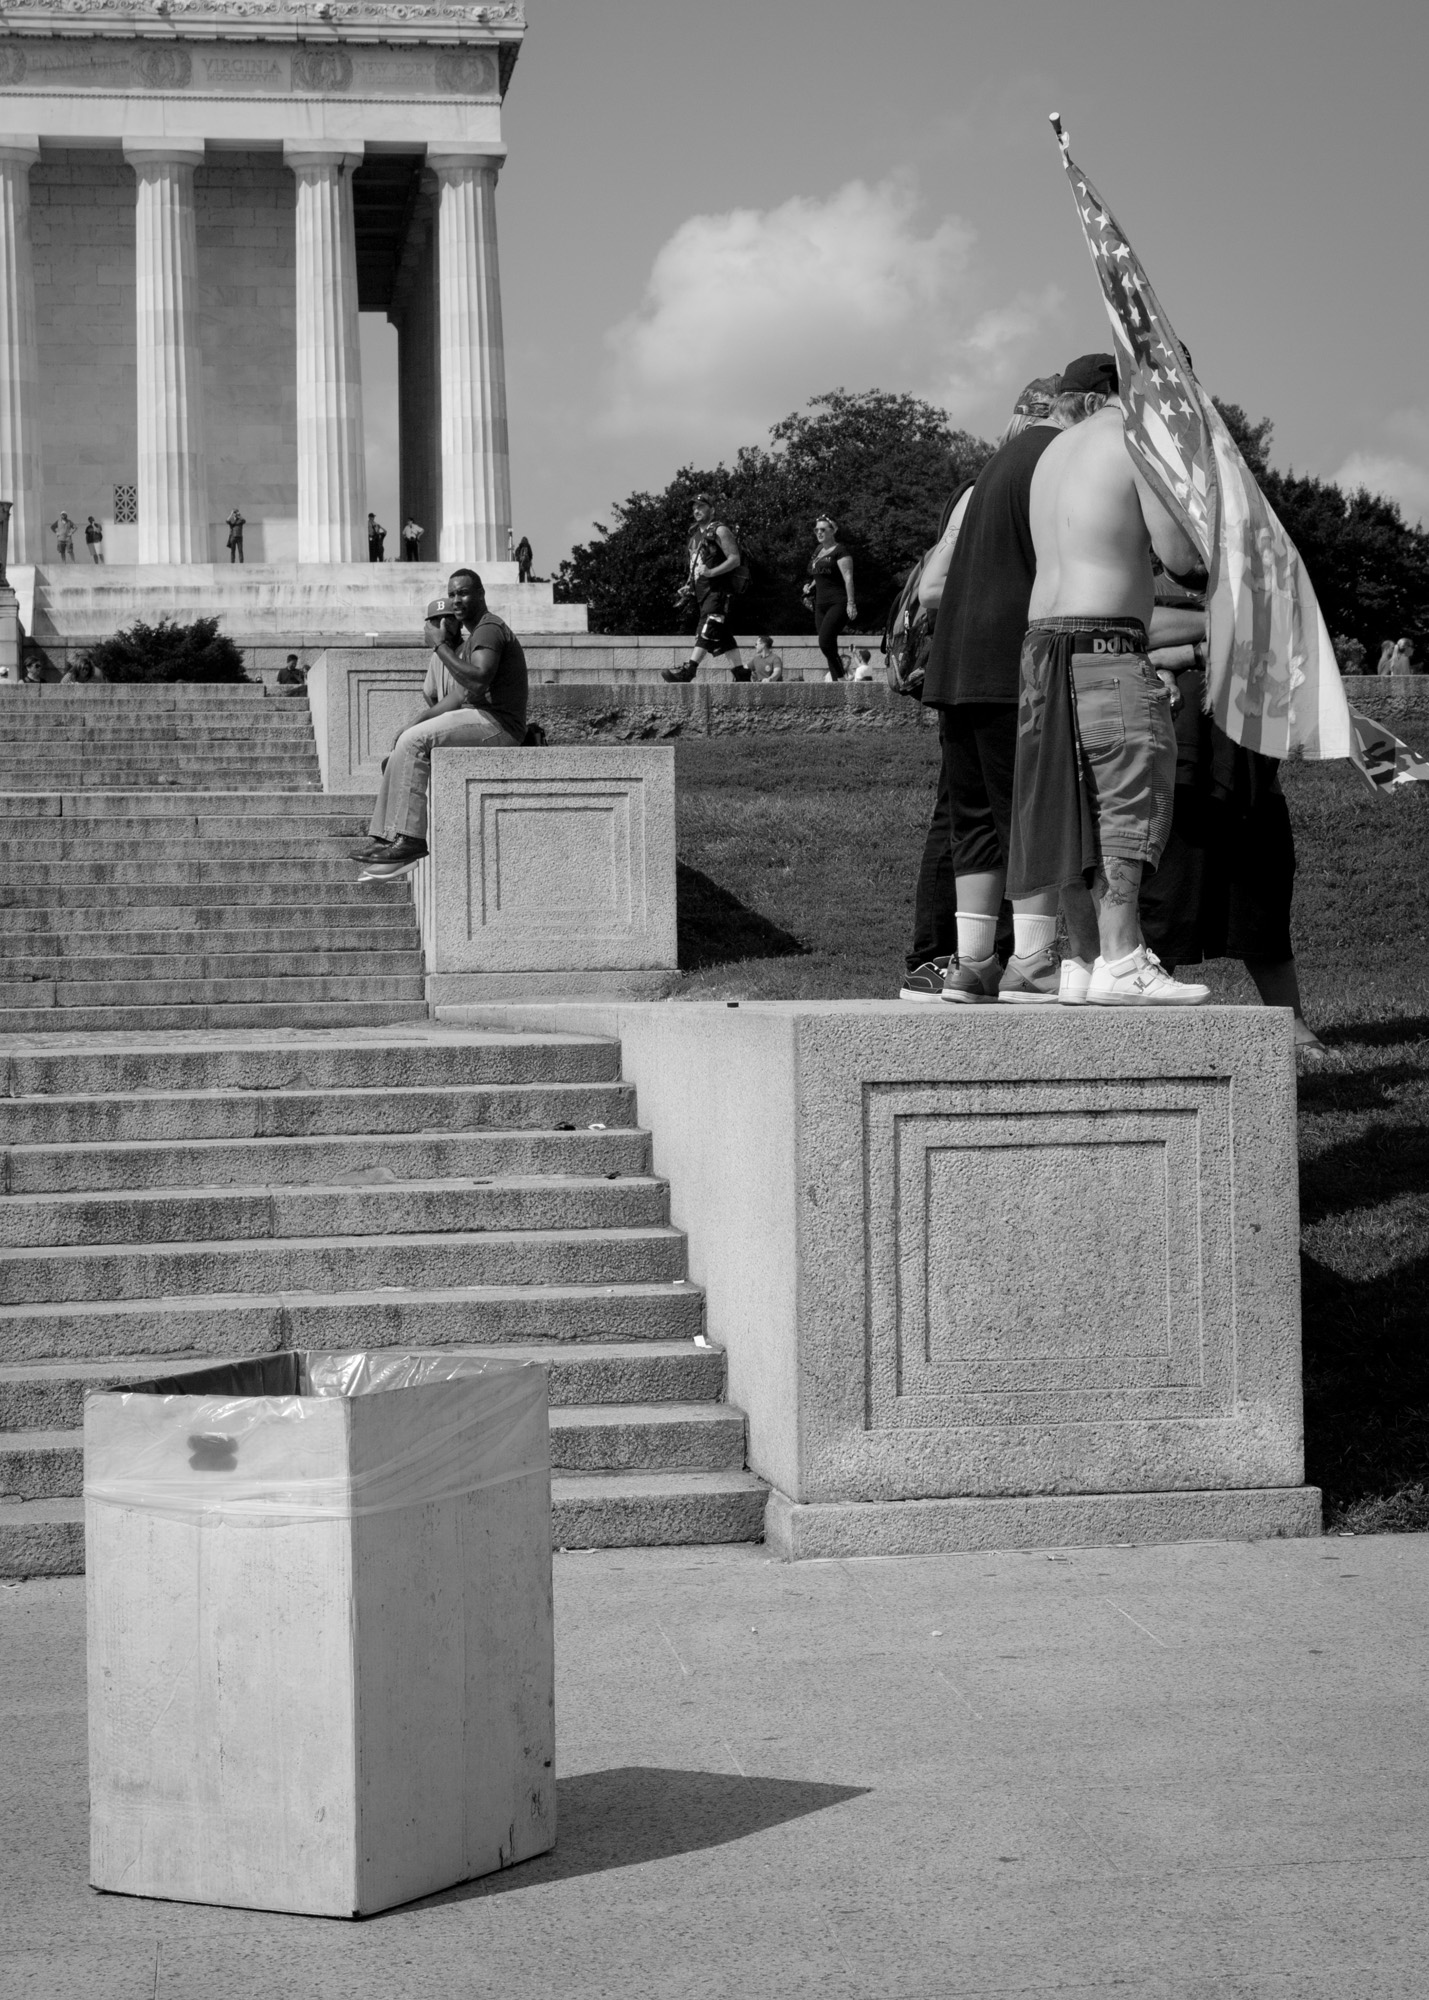 Juggalo March on Washington 2017_Photos by Daniel Terna-1.jpg